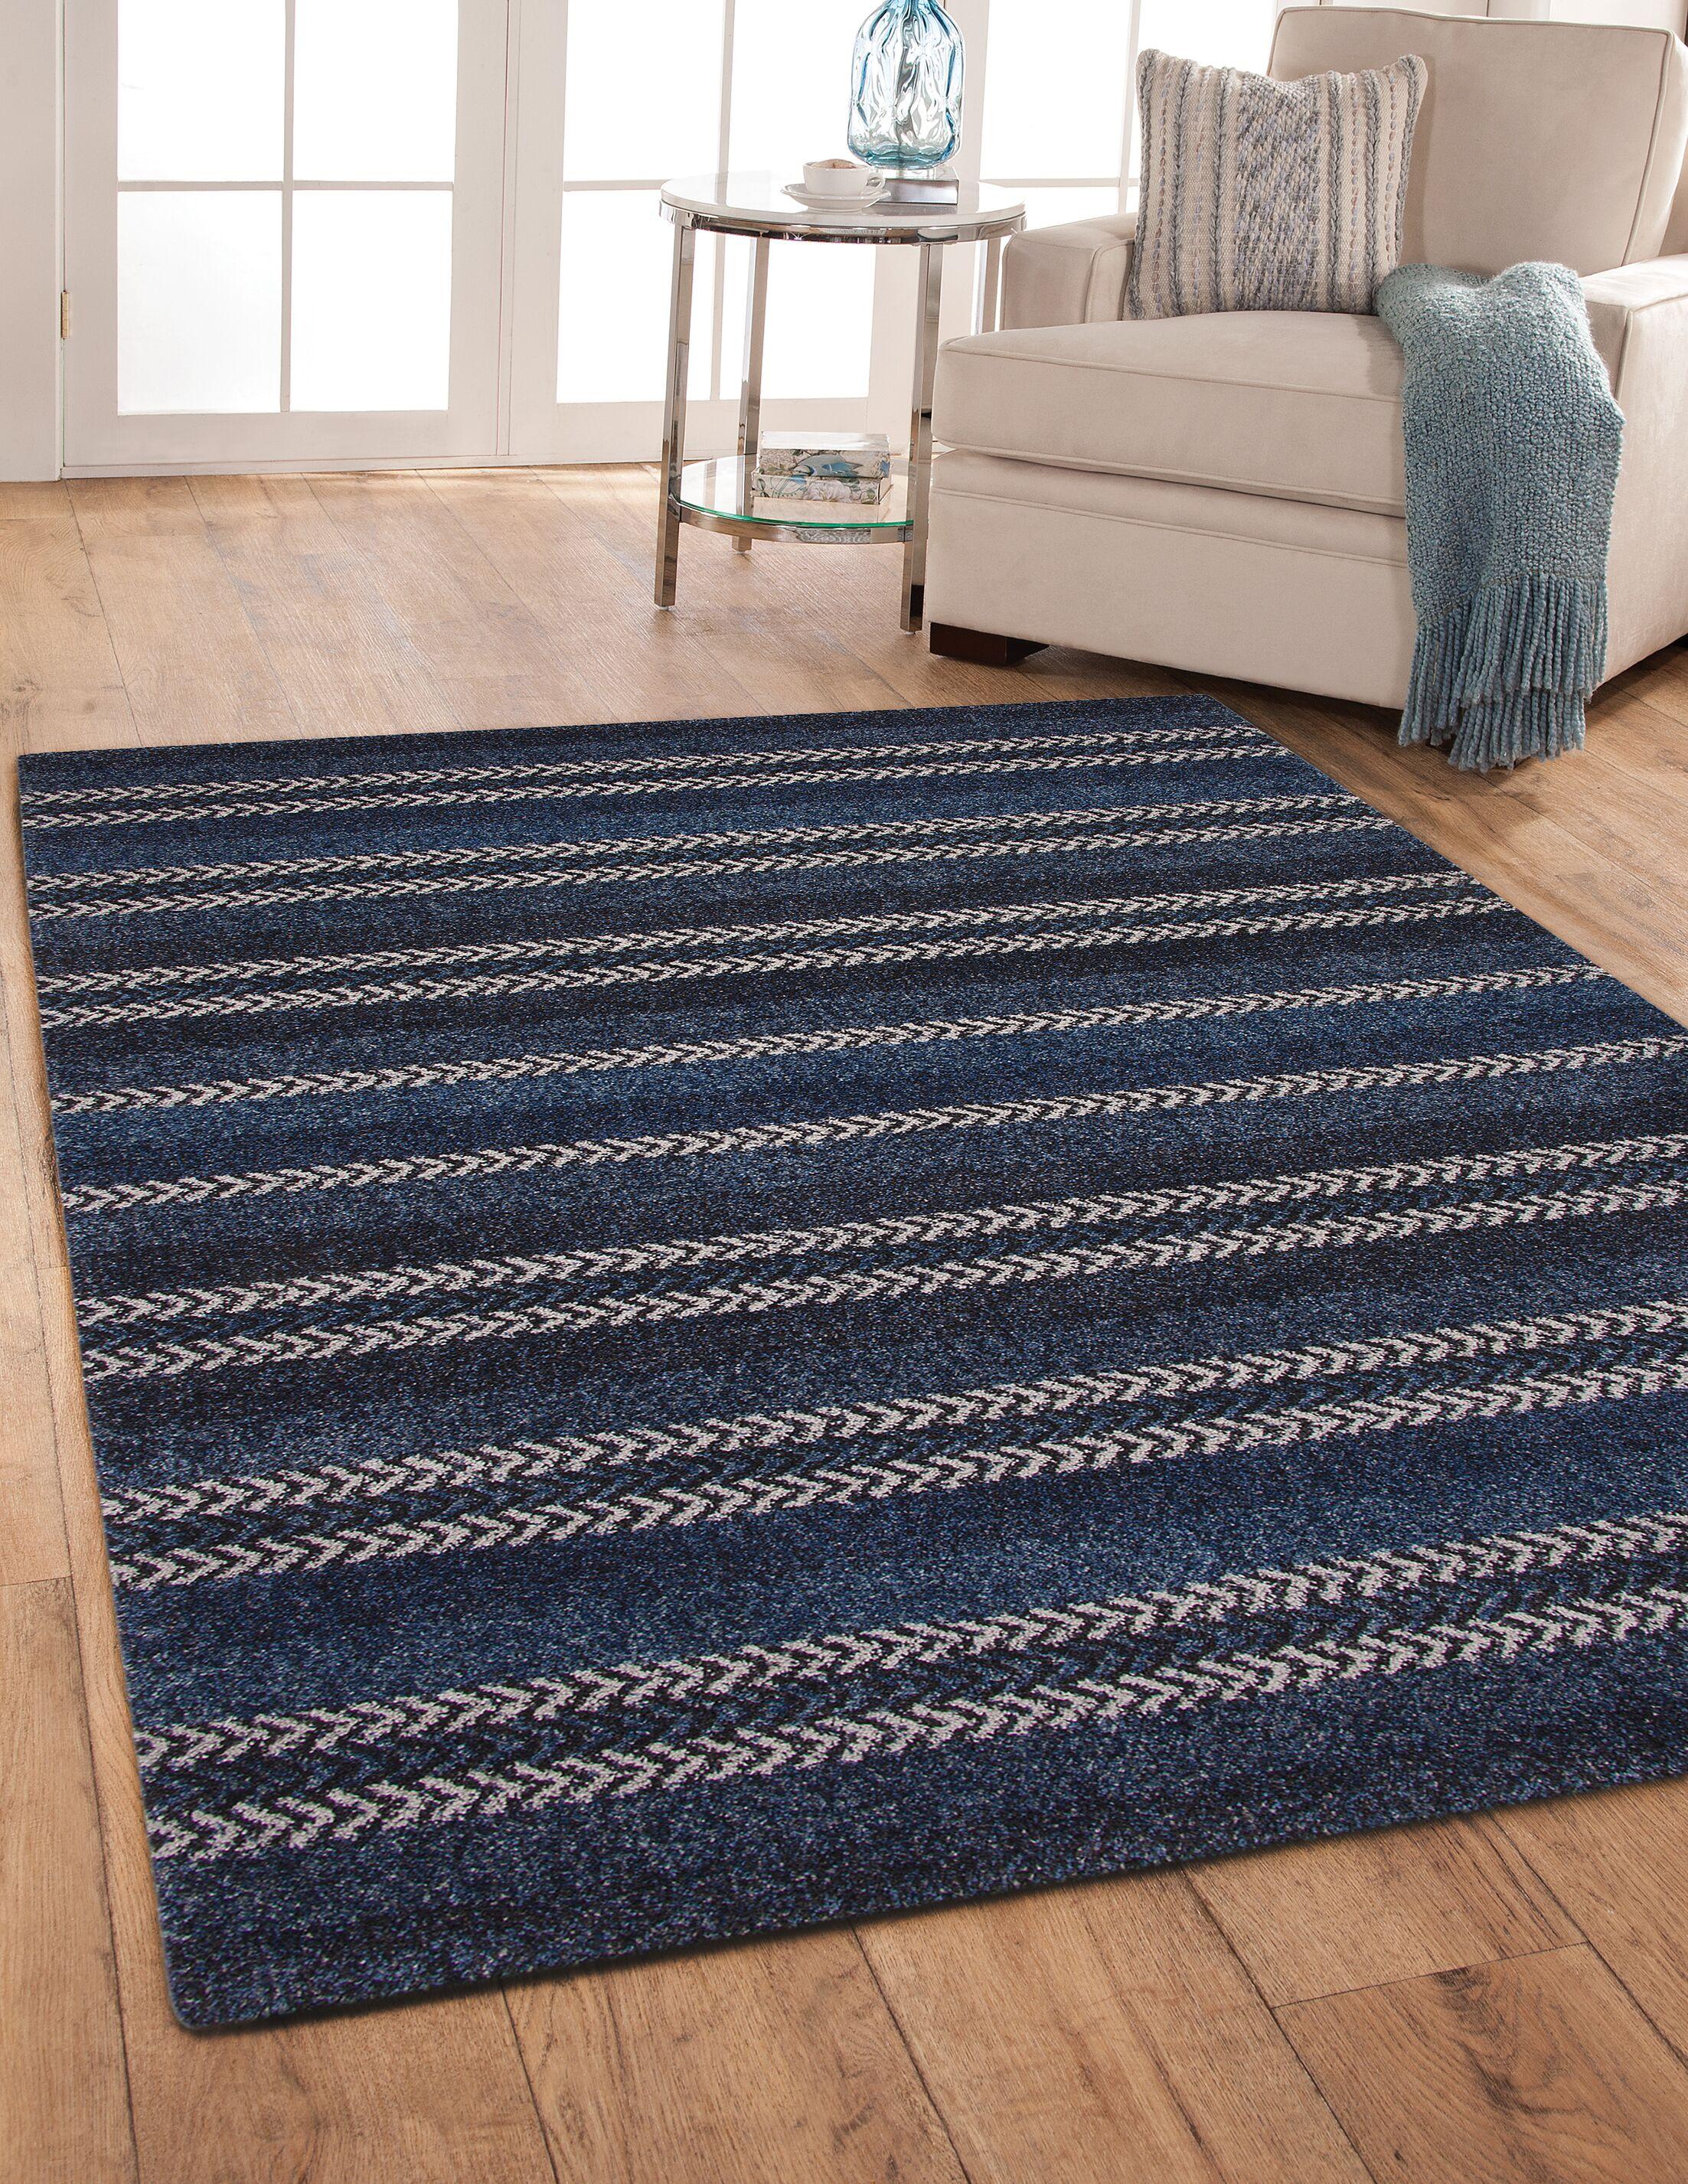 Adamsburg Blue/Black Area Rug Rug Size: Rectangle 5' x 8'